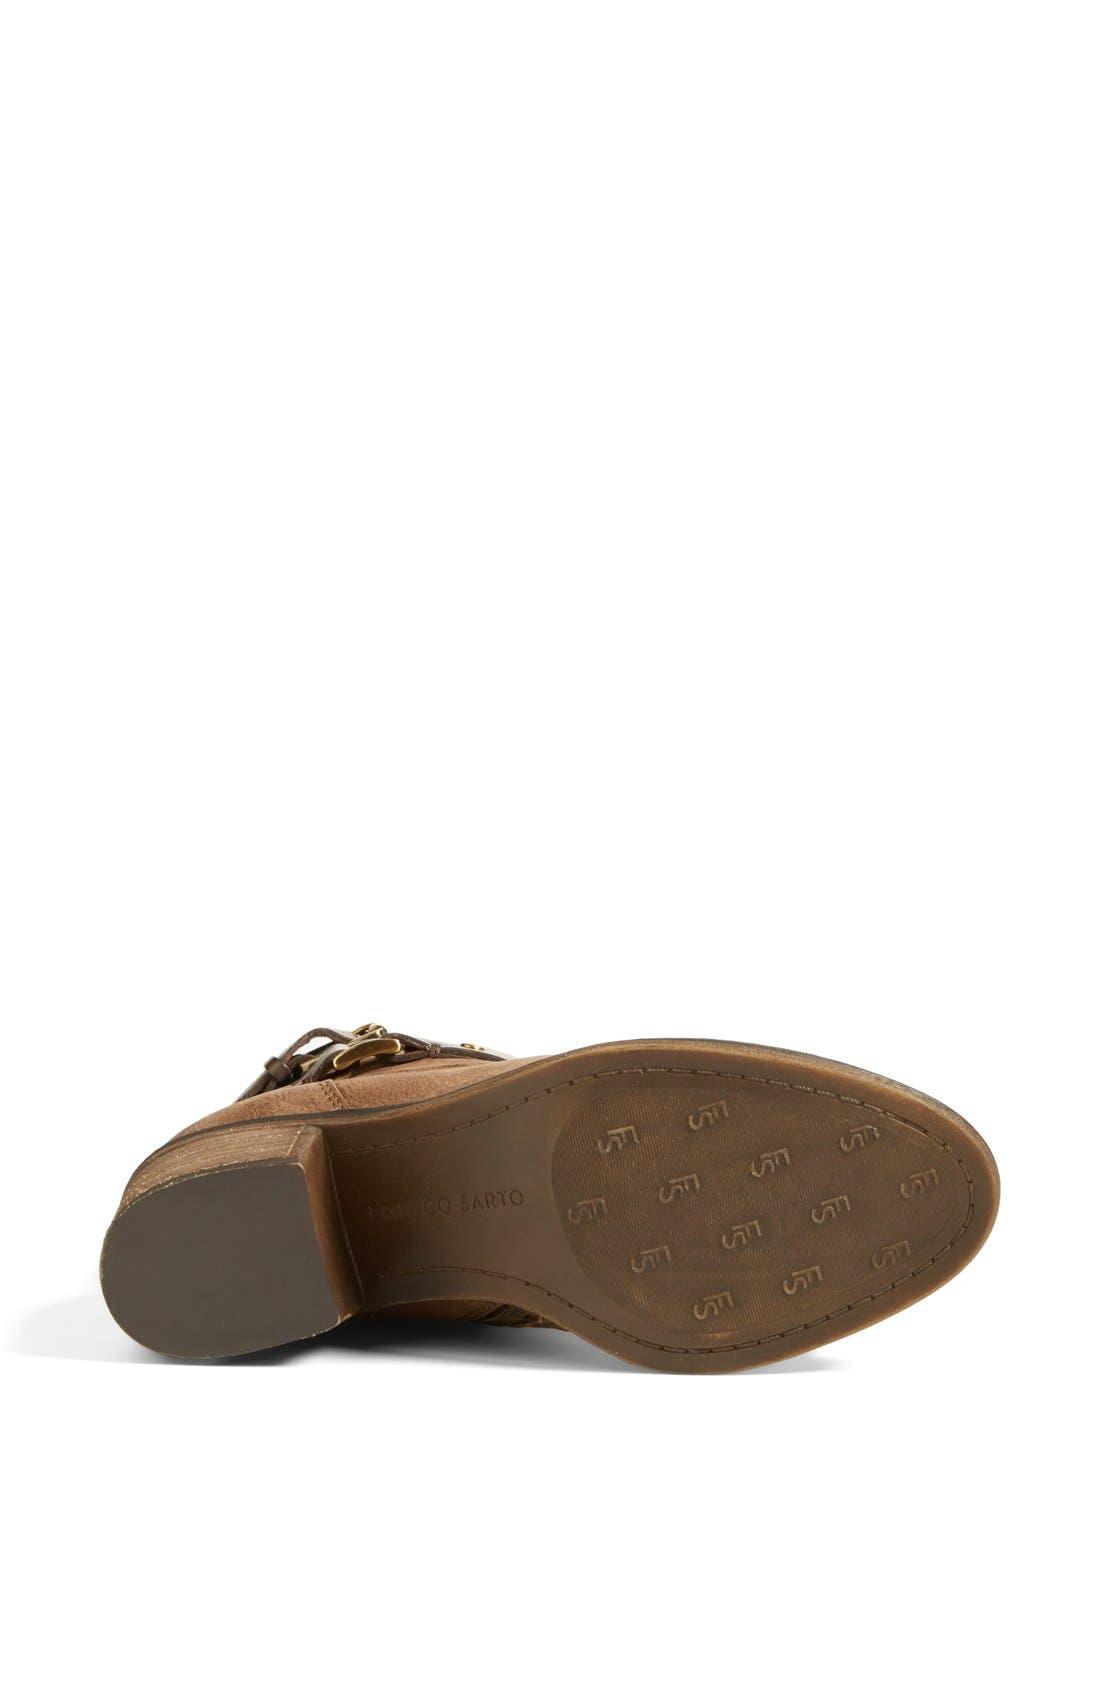 Alternate Image 4  - Franco Sarto 'Linden' Leather Bootie (Women) (Nordstrom Exclusive)